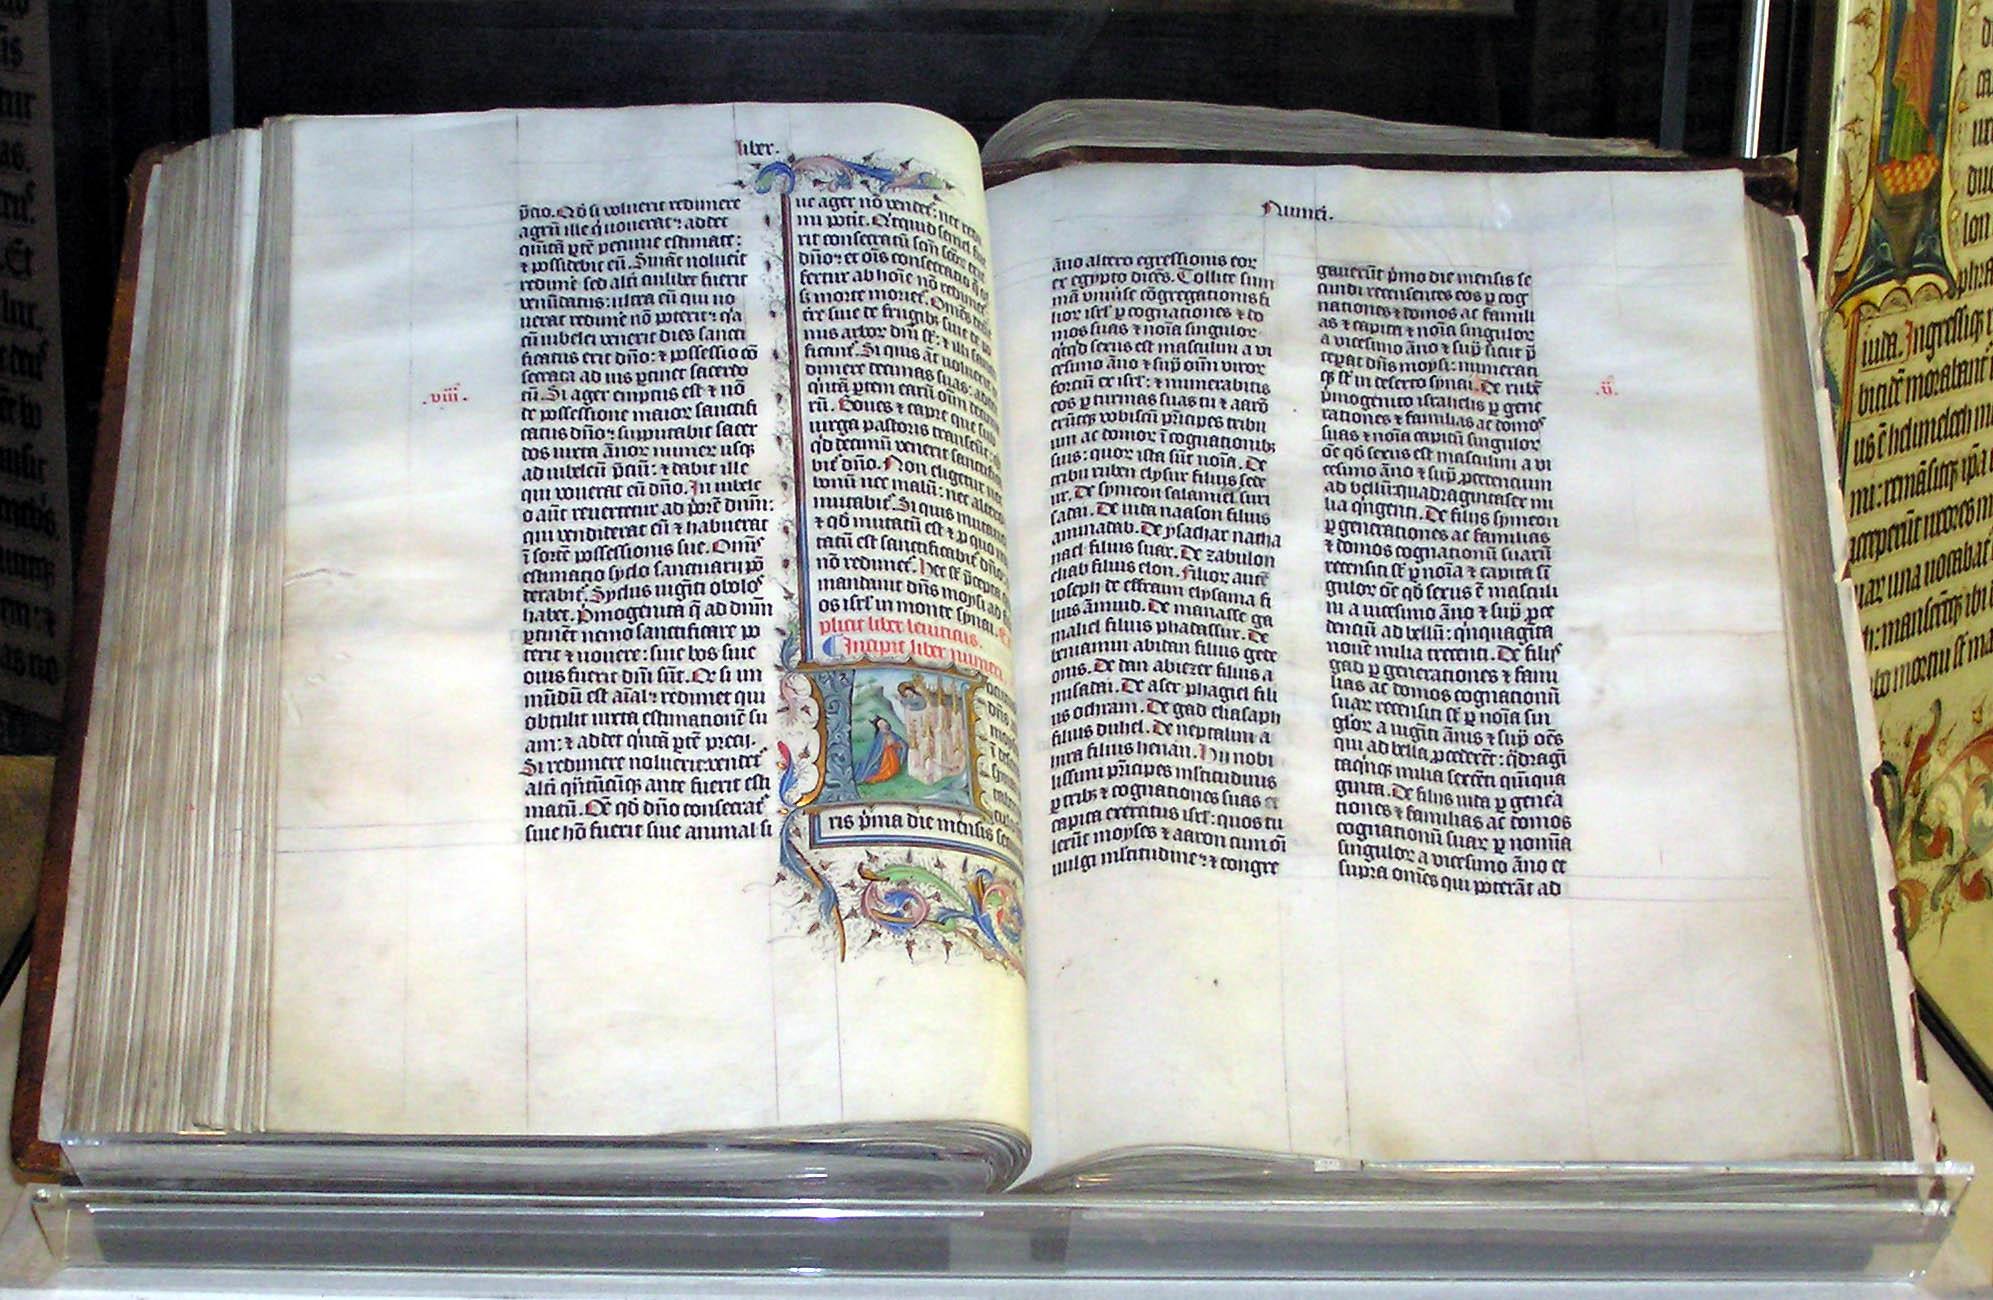 Interpreting Scripture's divine element